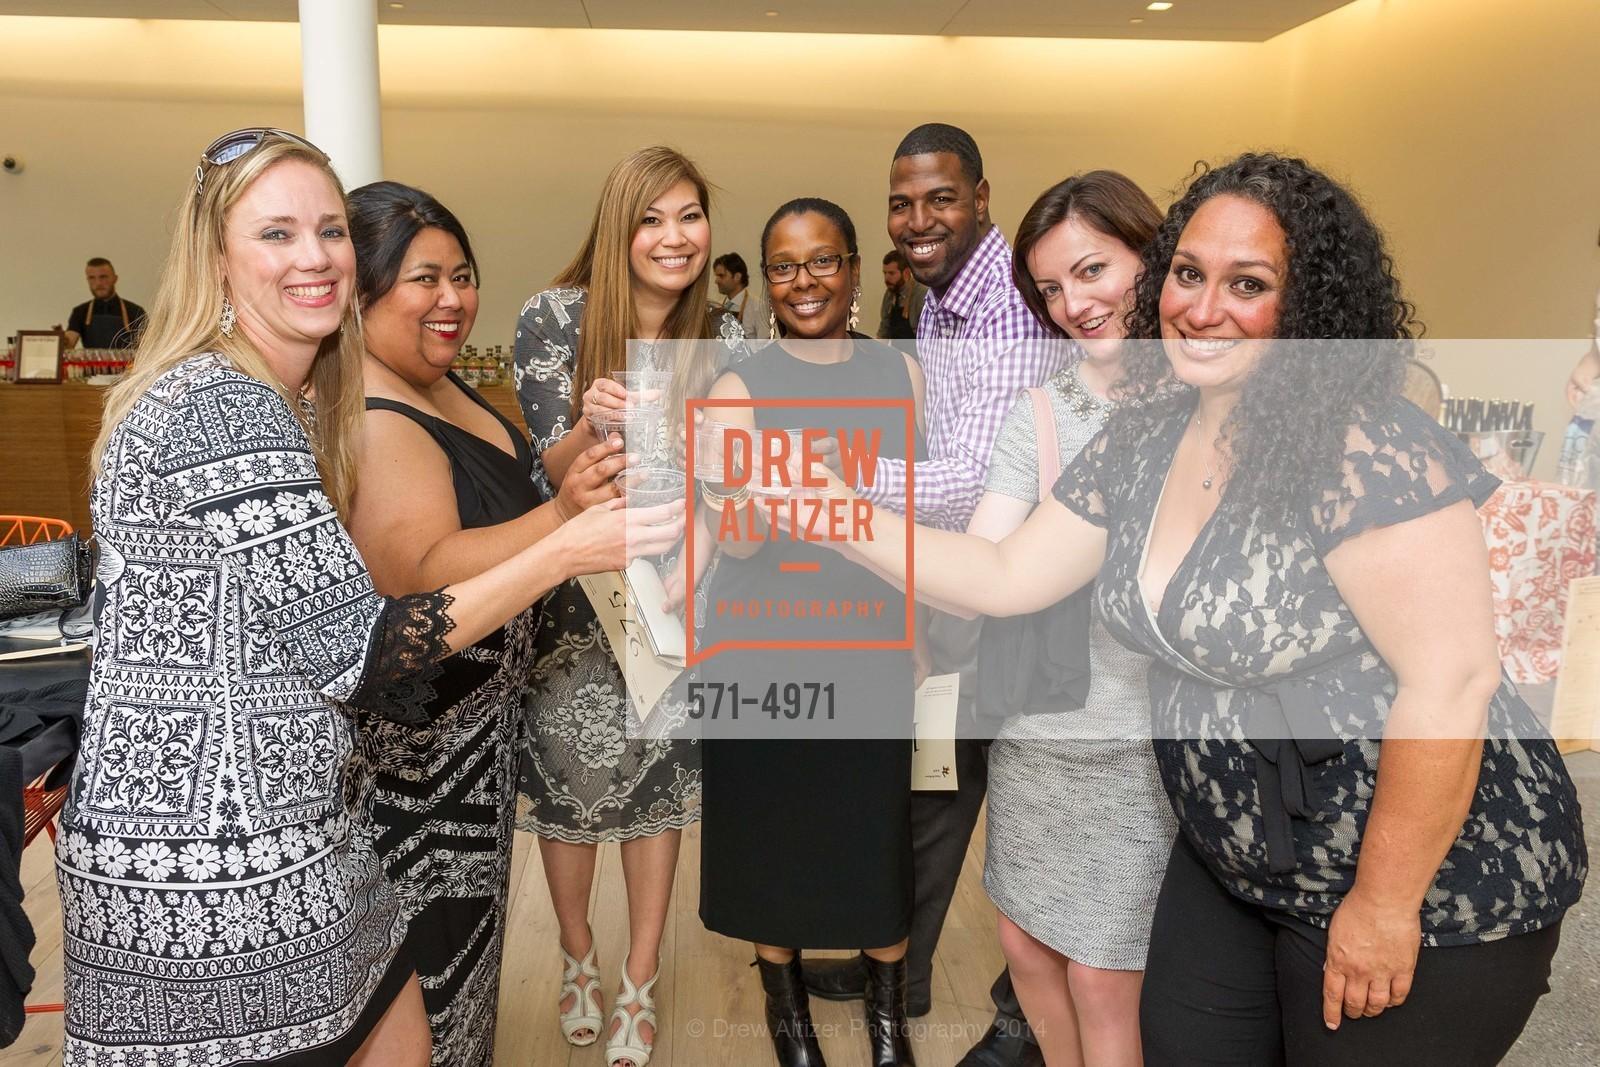 Guiselle Osorio, Kelly Zubal, Fernay McPherson, Charles Farrier, Claire Keane, Lisa Callahan, Photo #571-4971